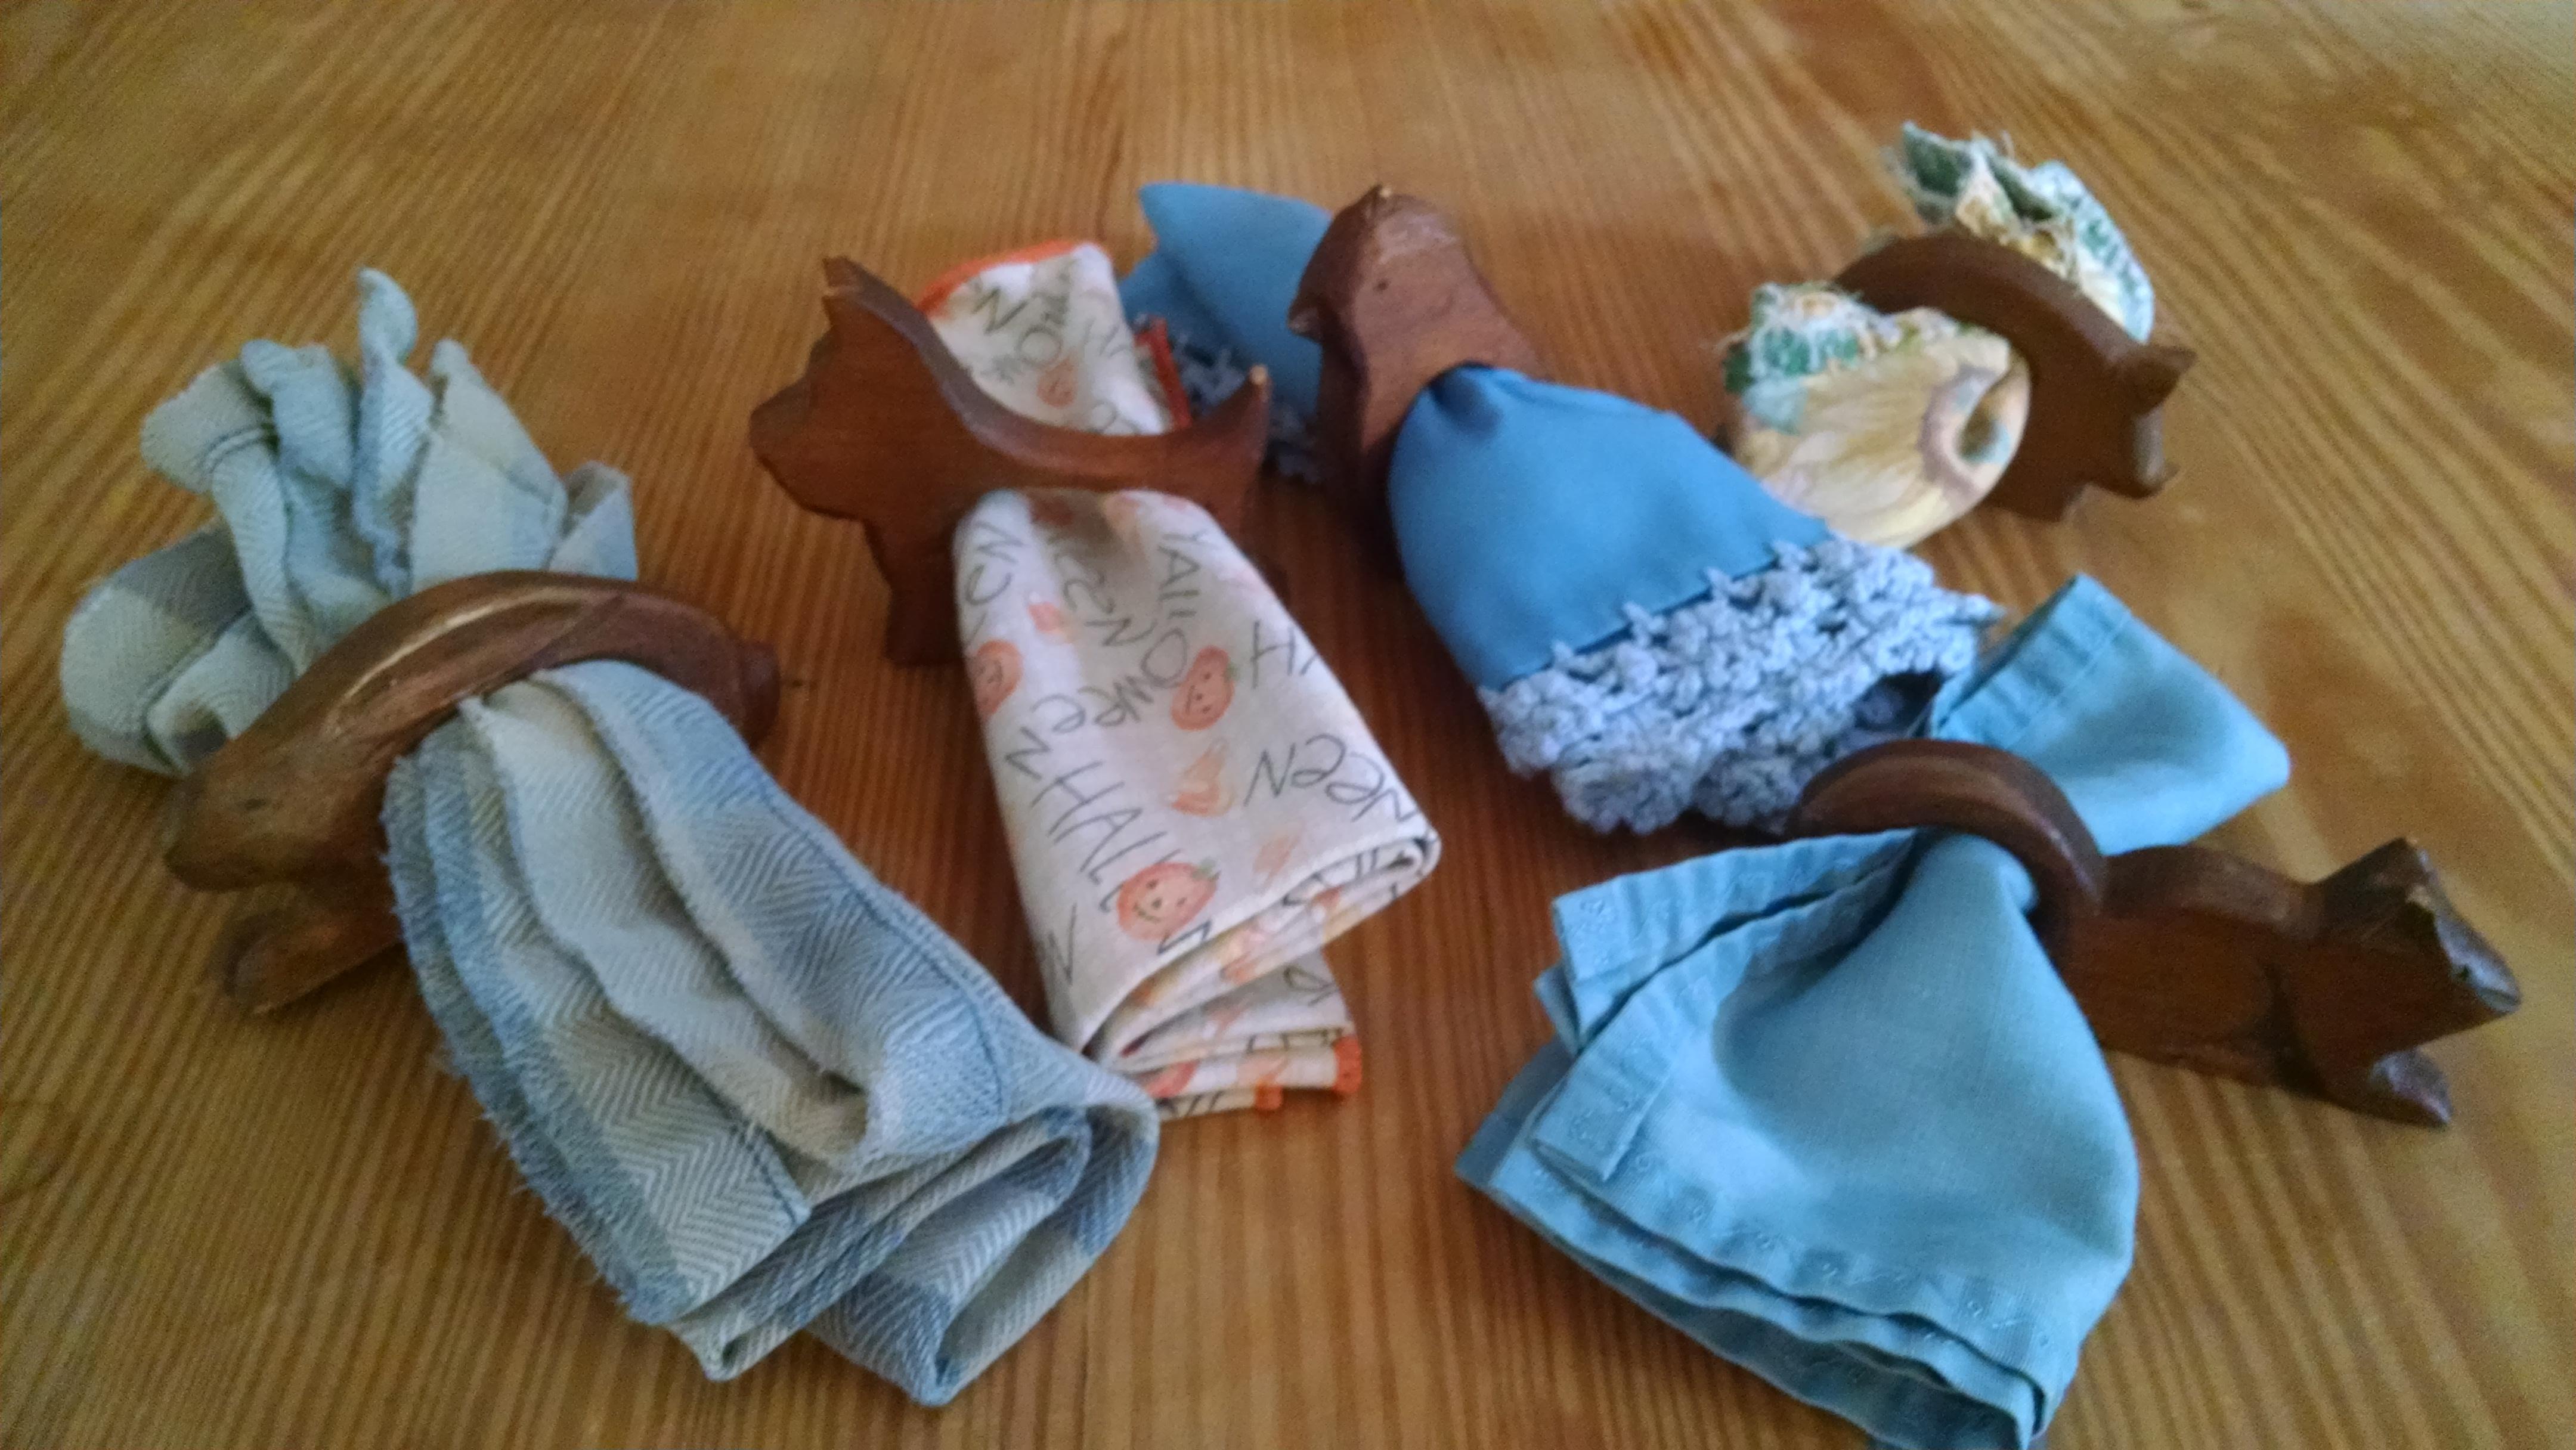 Rustic napkin holders